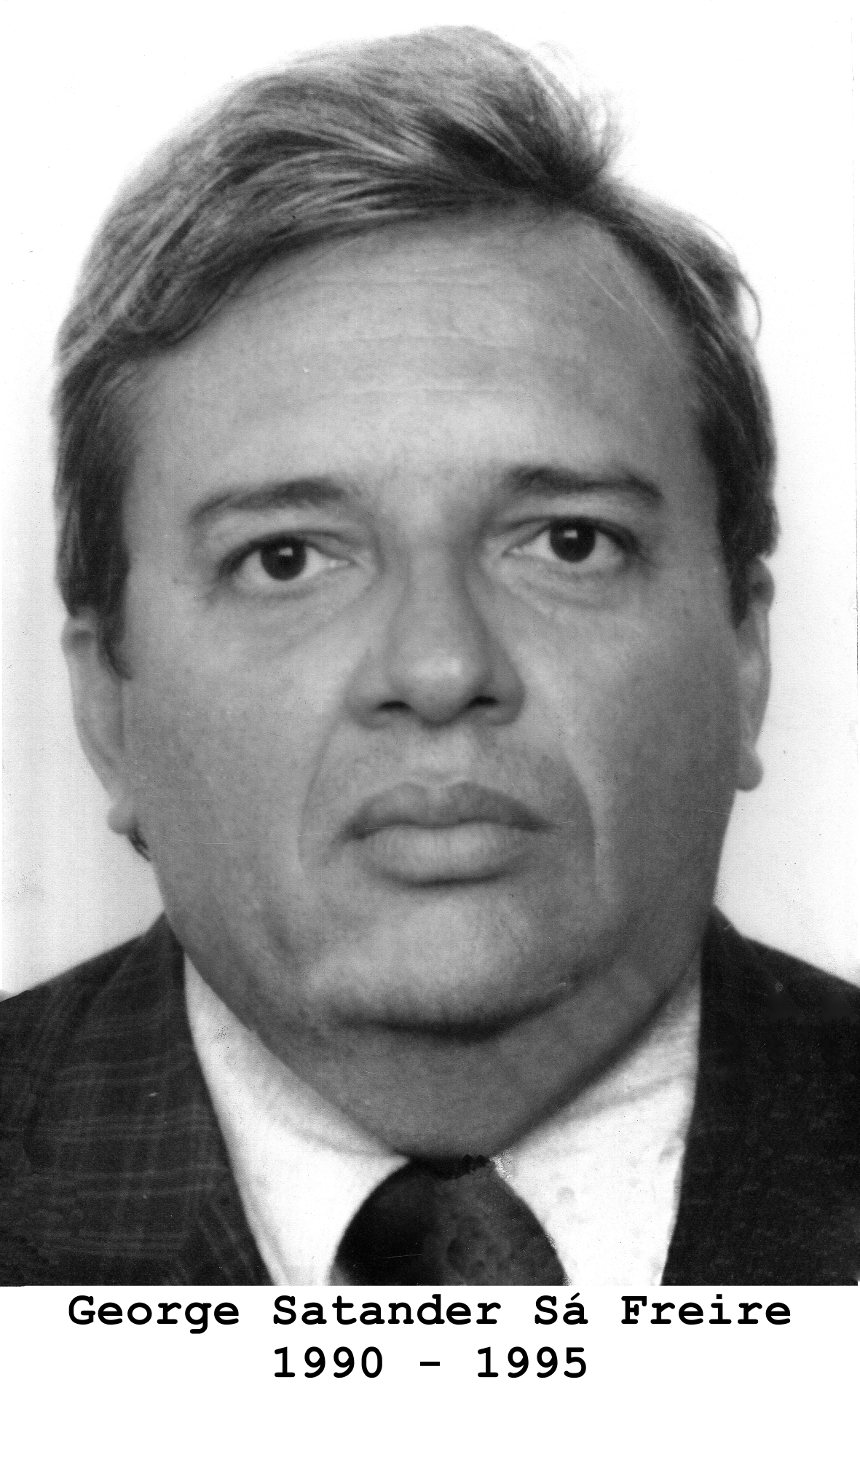 George Satander Sá Freire 1990 - 1995